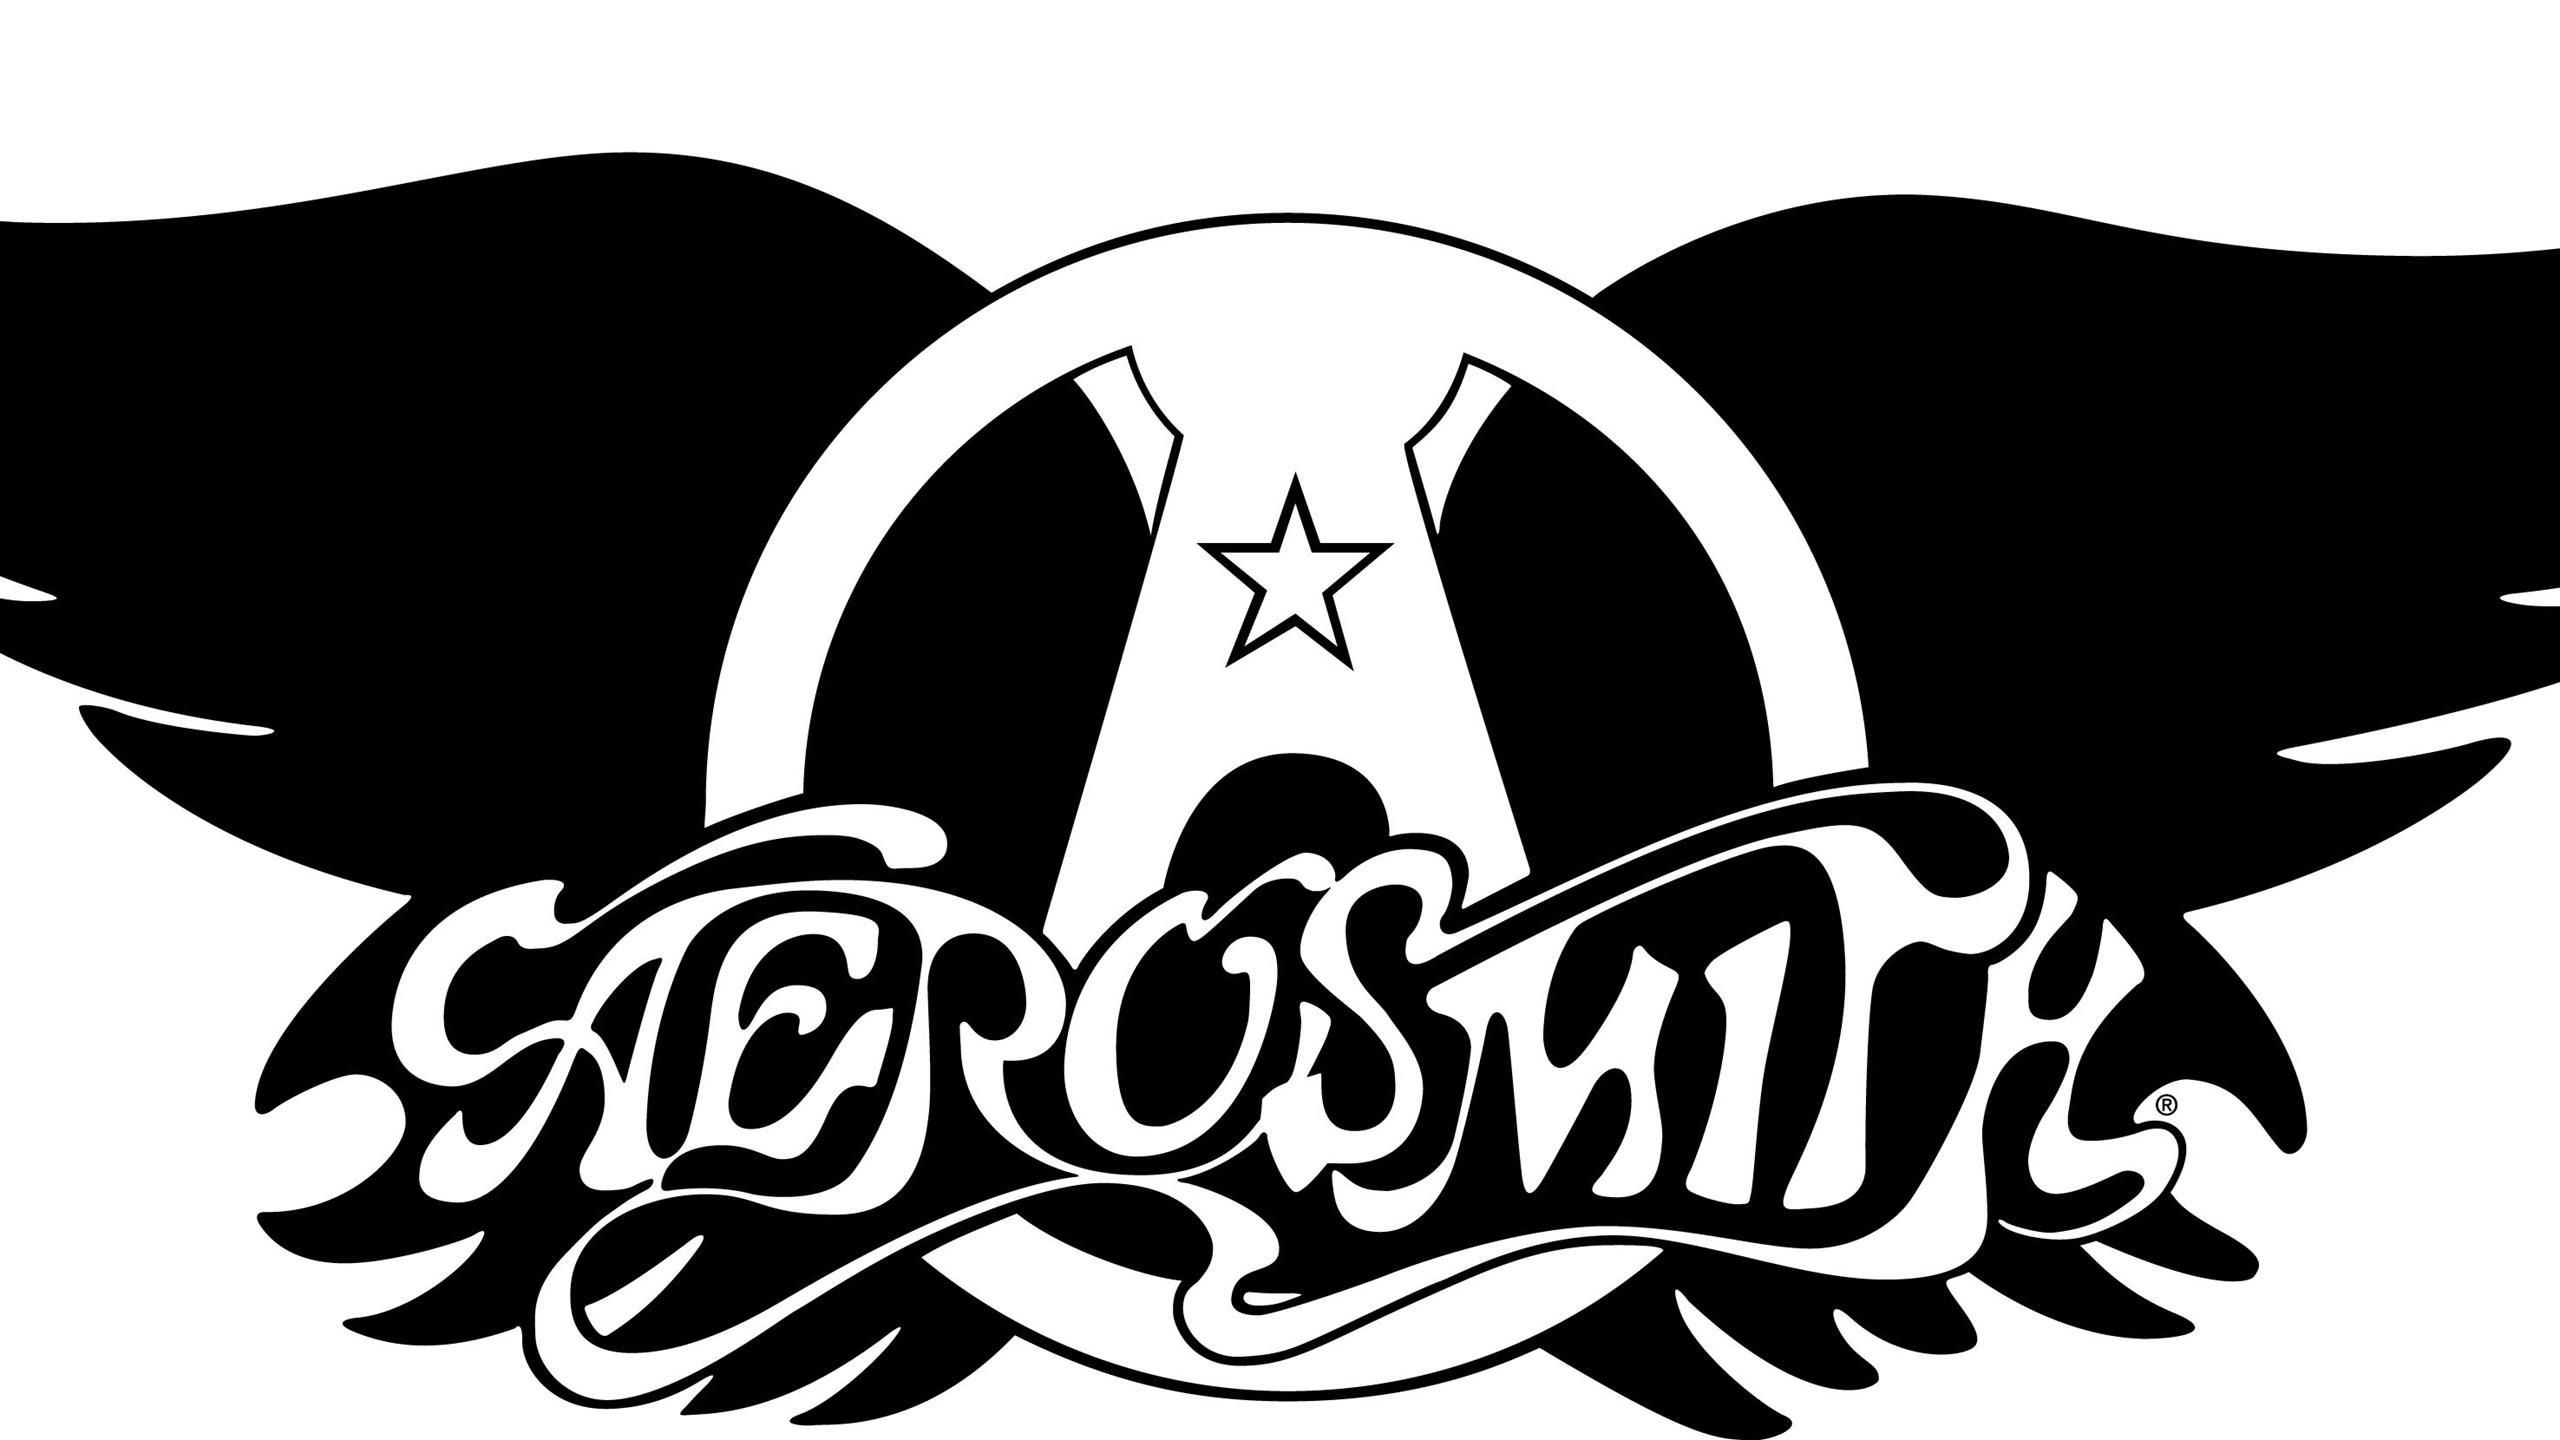 Aerosmith Logo Image Galleries Imagekbcom Desktop Background